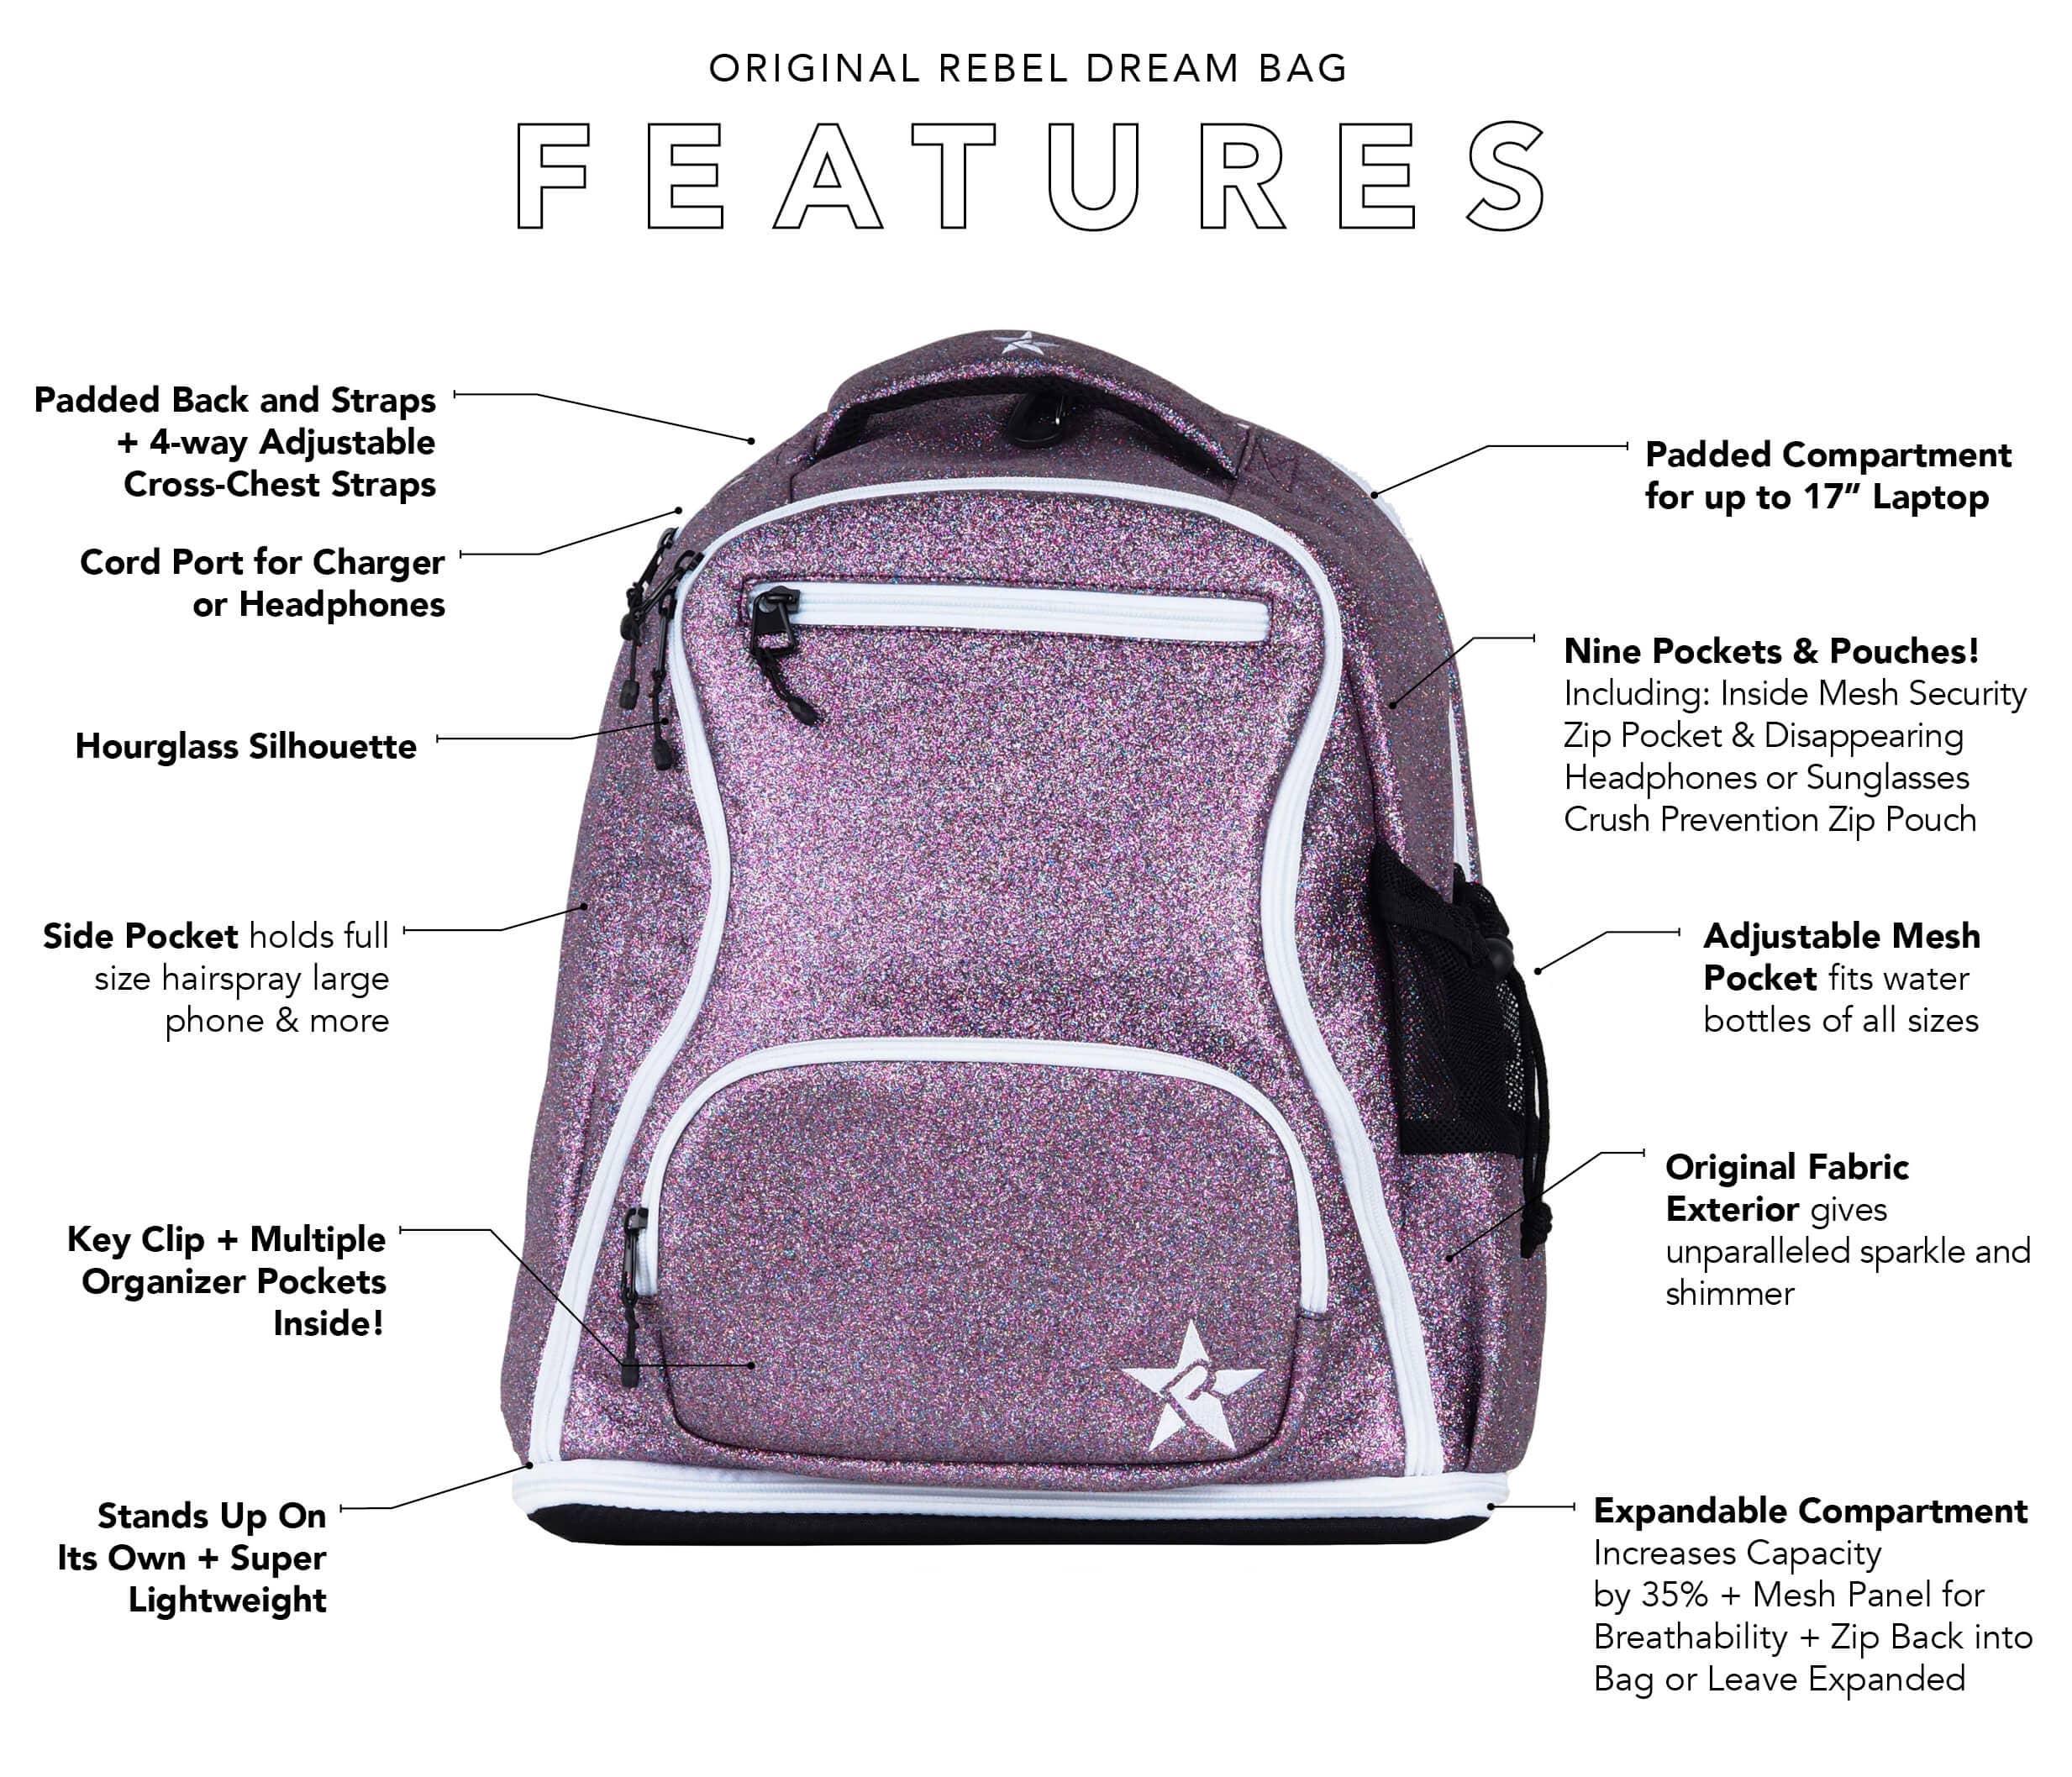 opalescent rebel dream bag key features